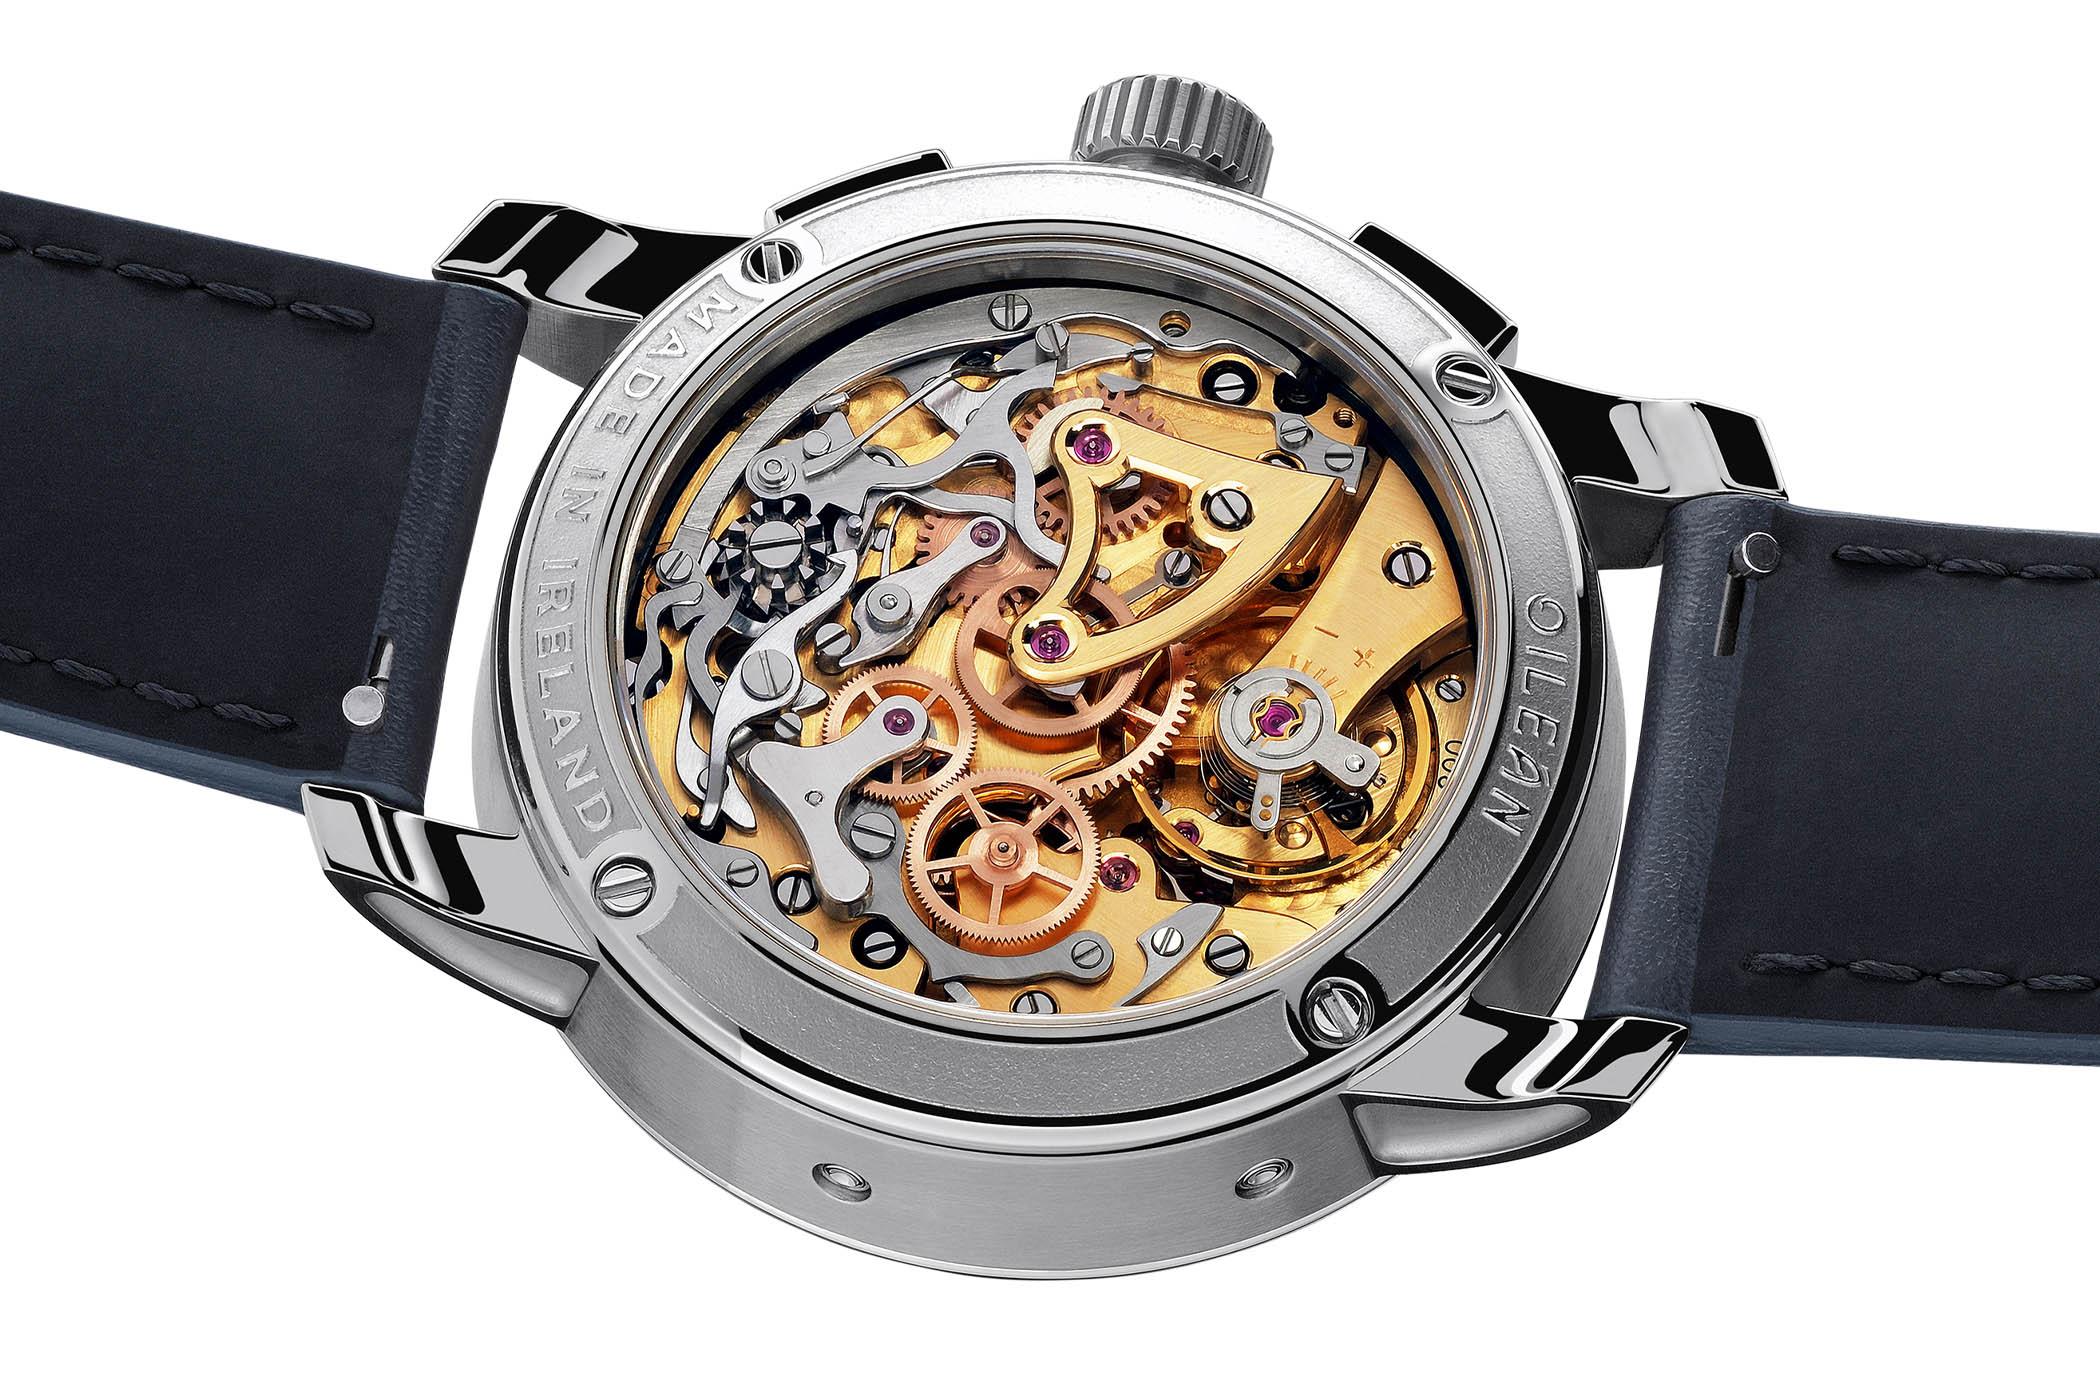 Oilean Watches by John McGonigle - H-B1 Chronograph Triple Calendar